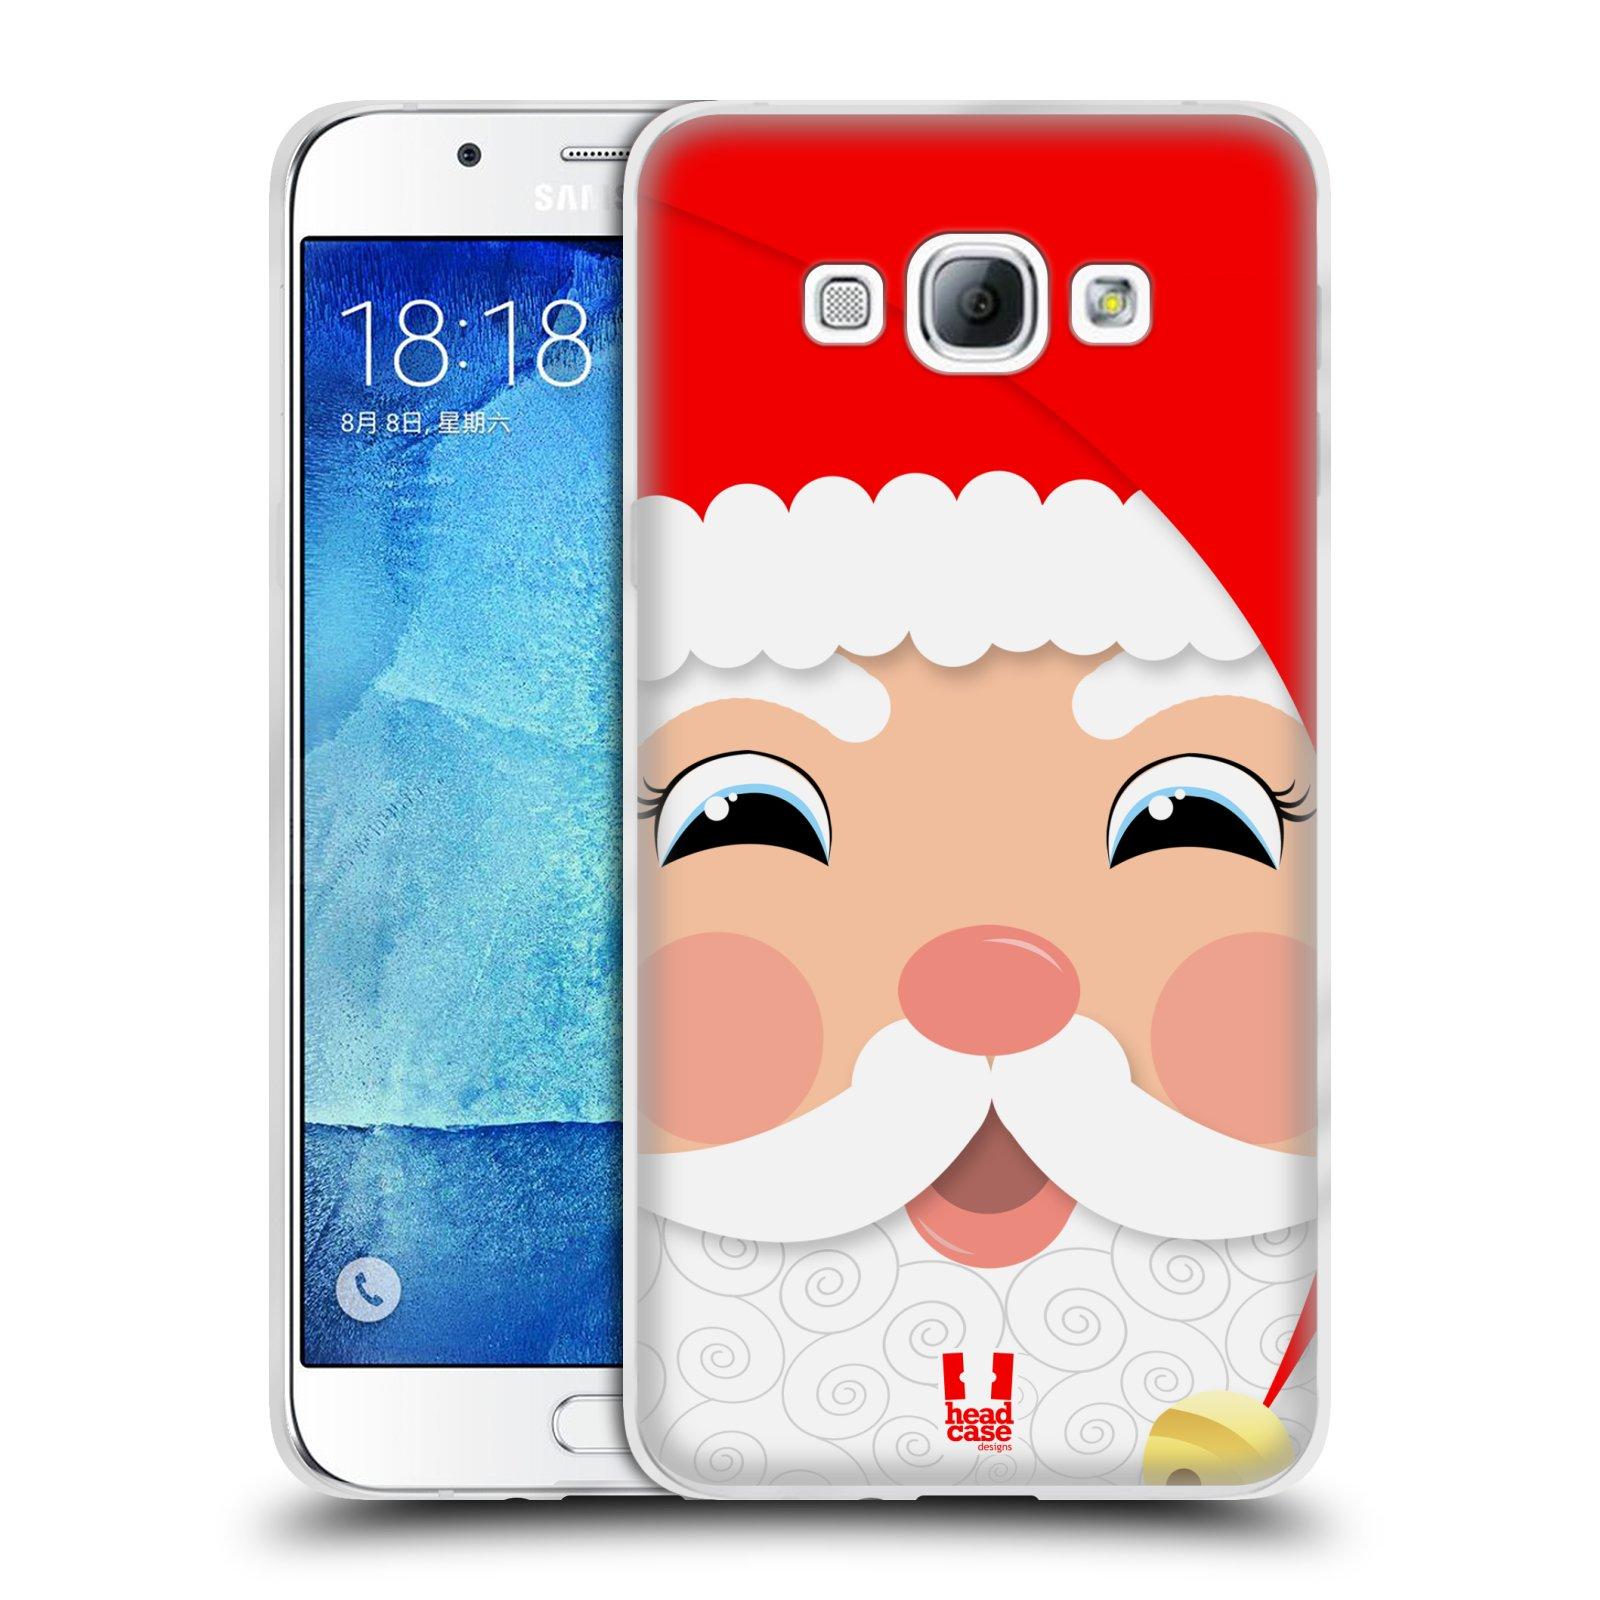 HEAD CASE silikonový obal na mobil Samsung Galaxy A8 vzor Vánoční tváře kreslené SANTA CLAUS